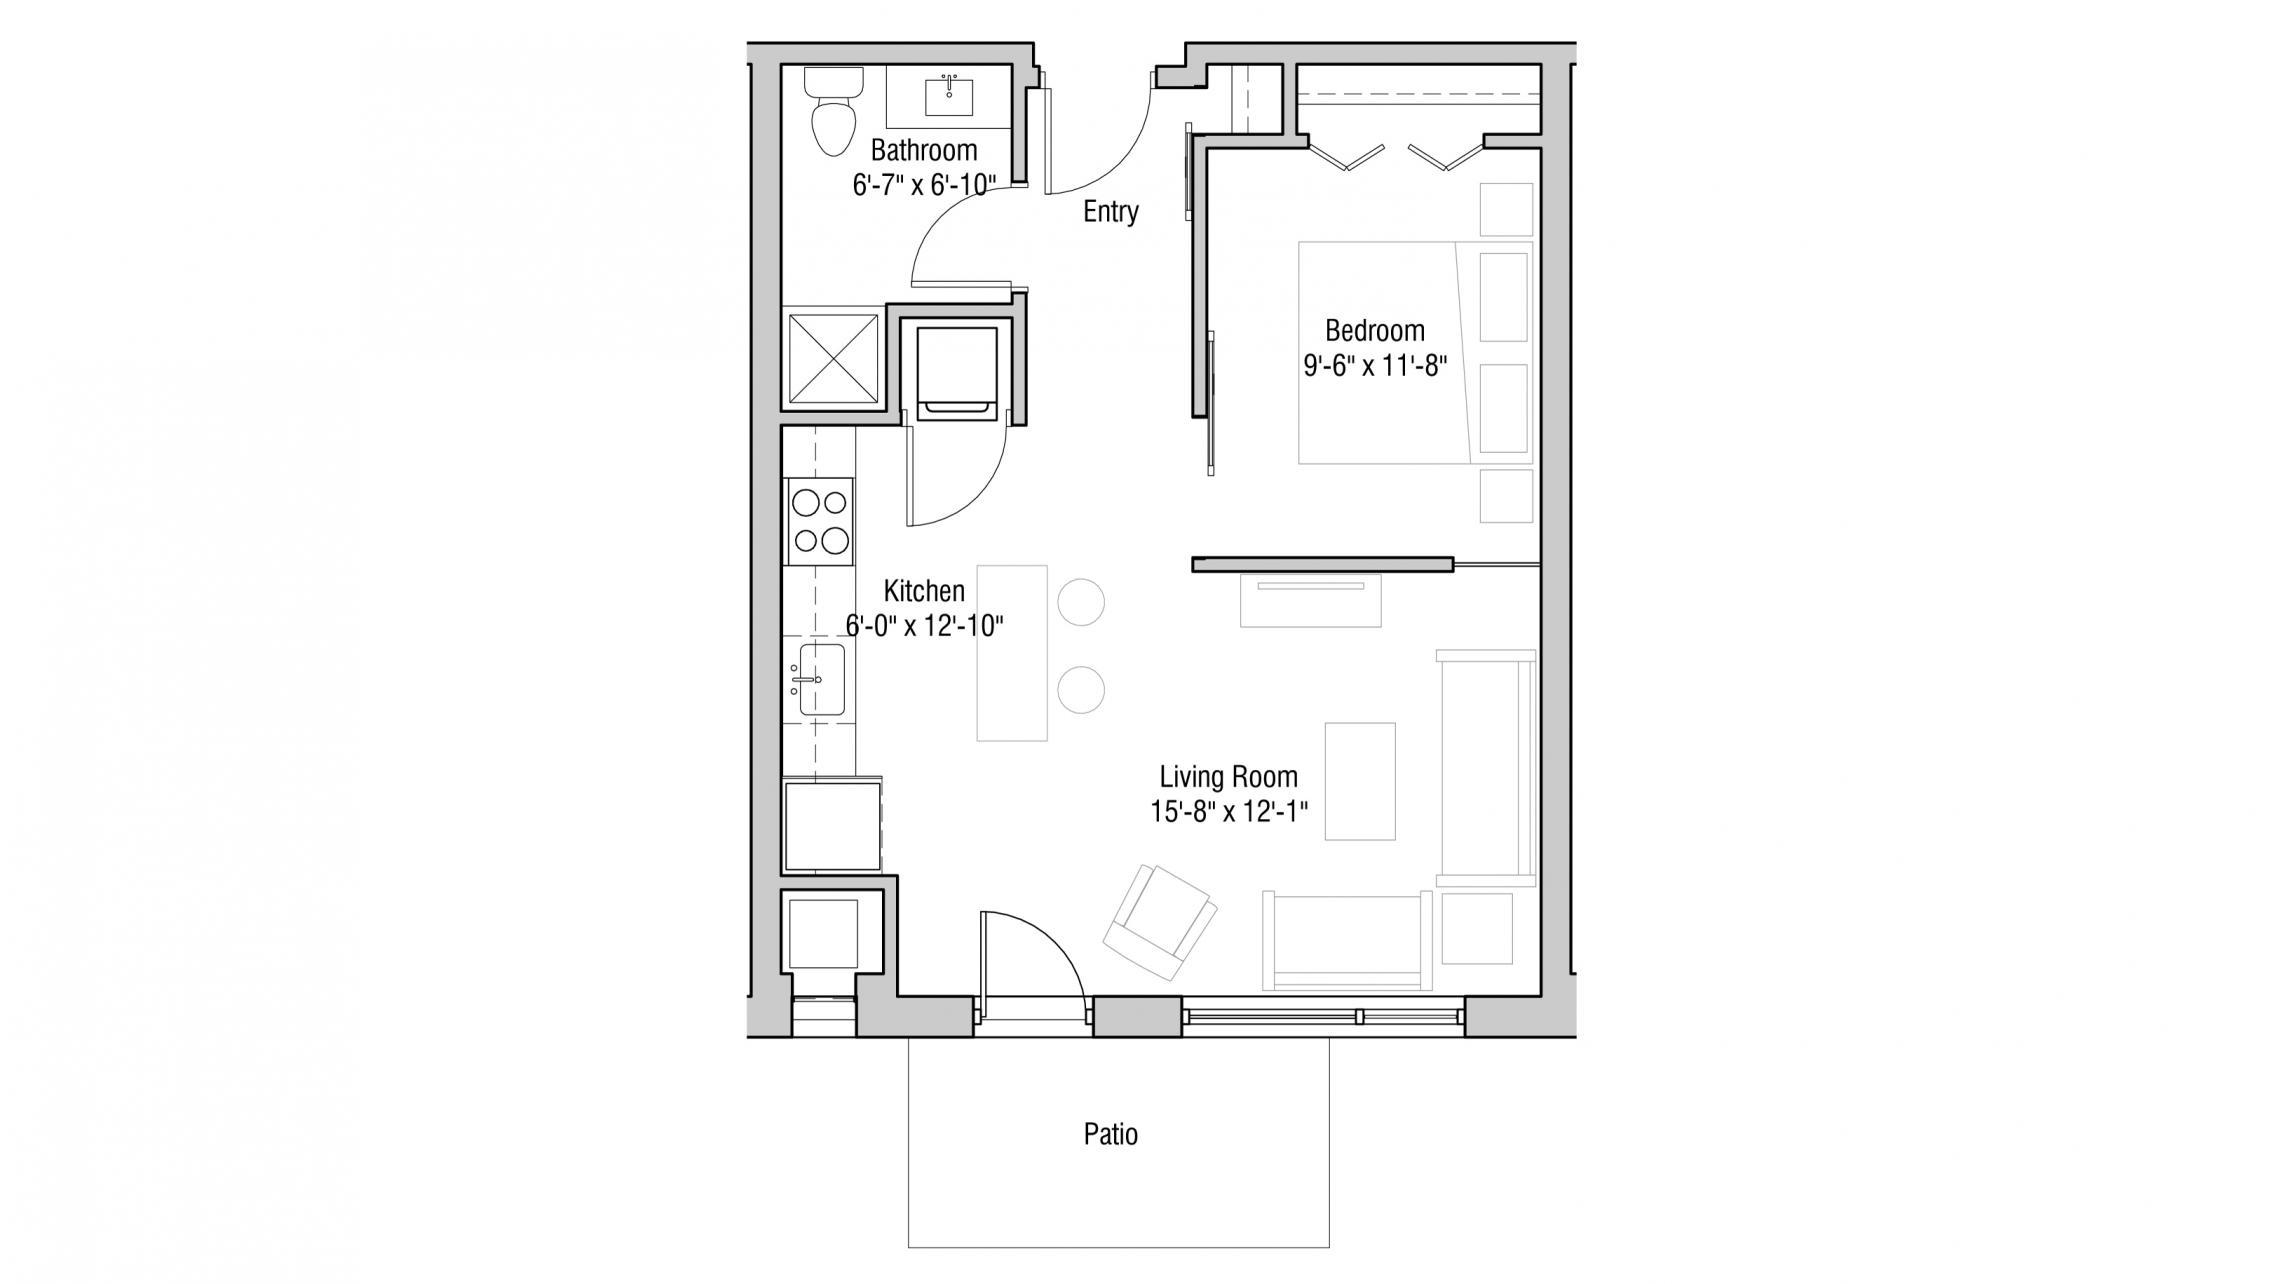 ULI Quarter Row 107 - One Bedroom, One Bathroom